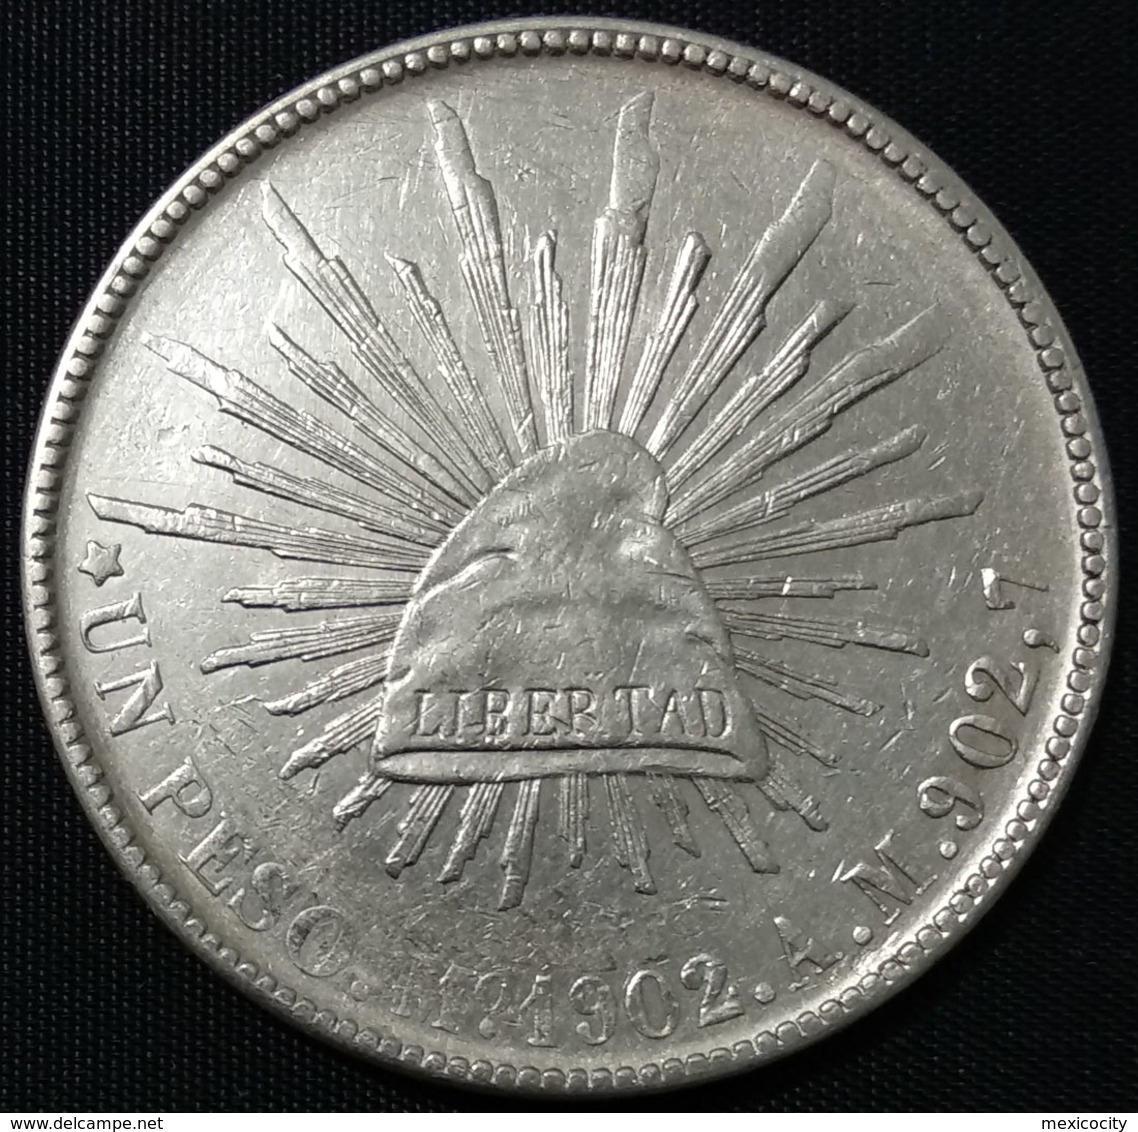 "MEXICO 1902 $1 SHINING CAP ""PESO FUERTE"" Series Silver Coin, ""Mexico City Mint, Assayer AM"" Original Shine - Mexico"